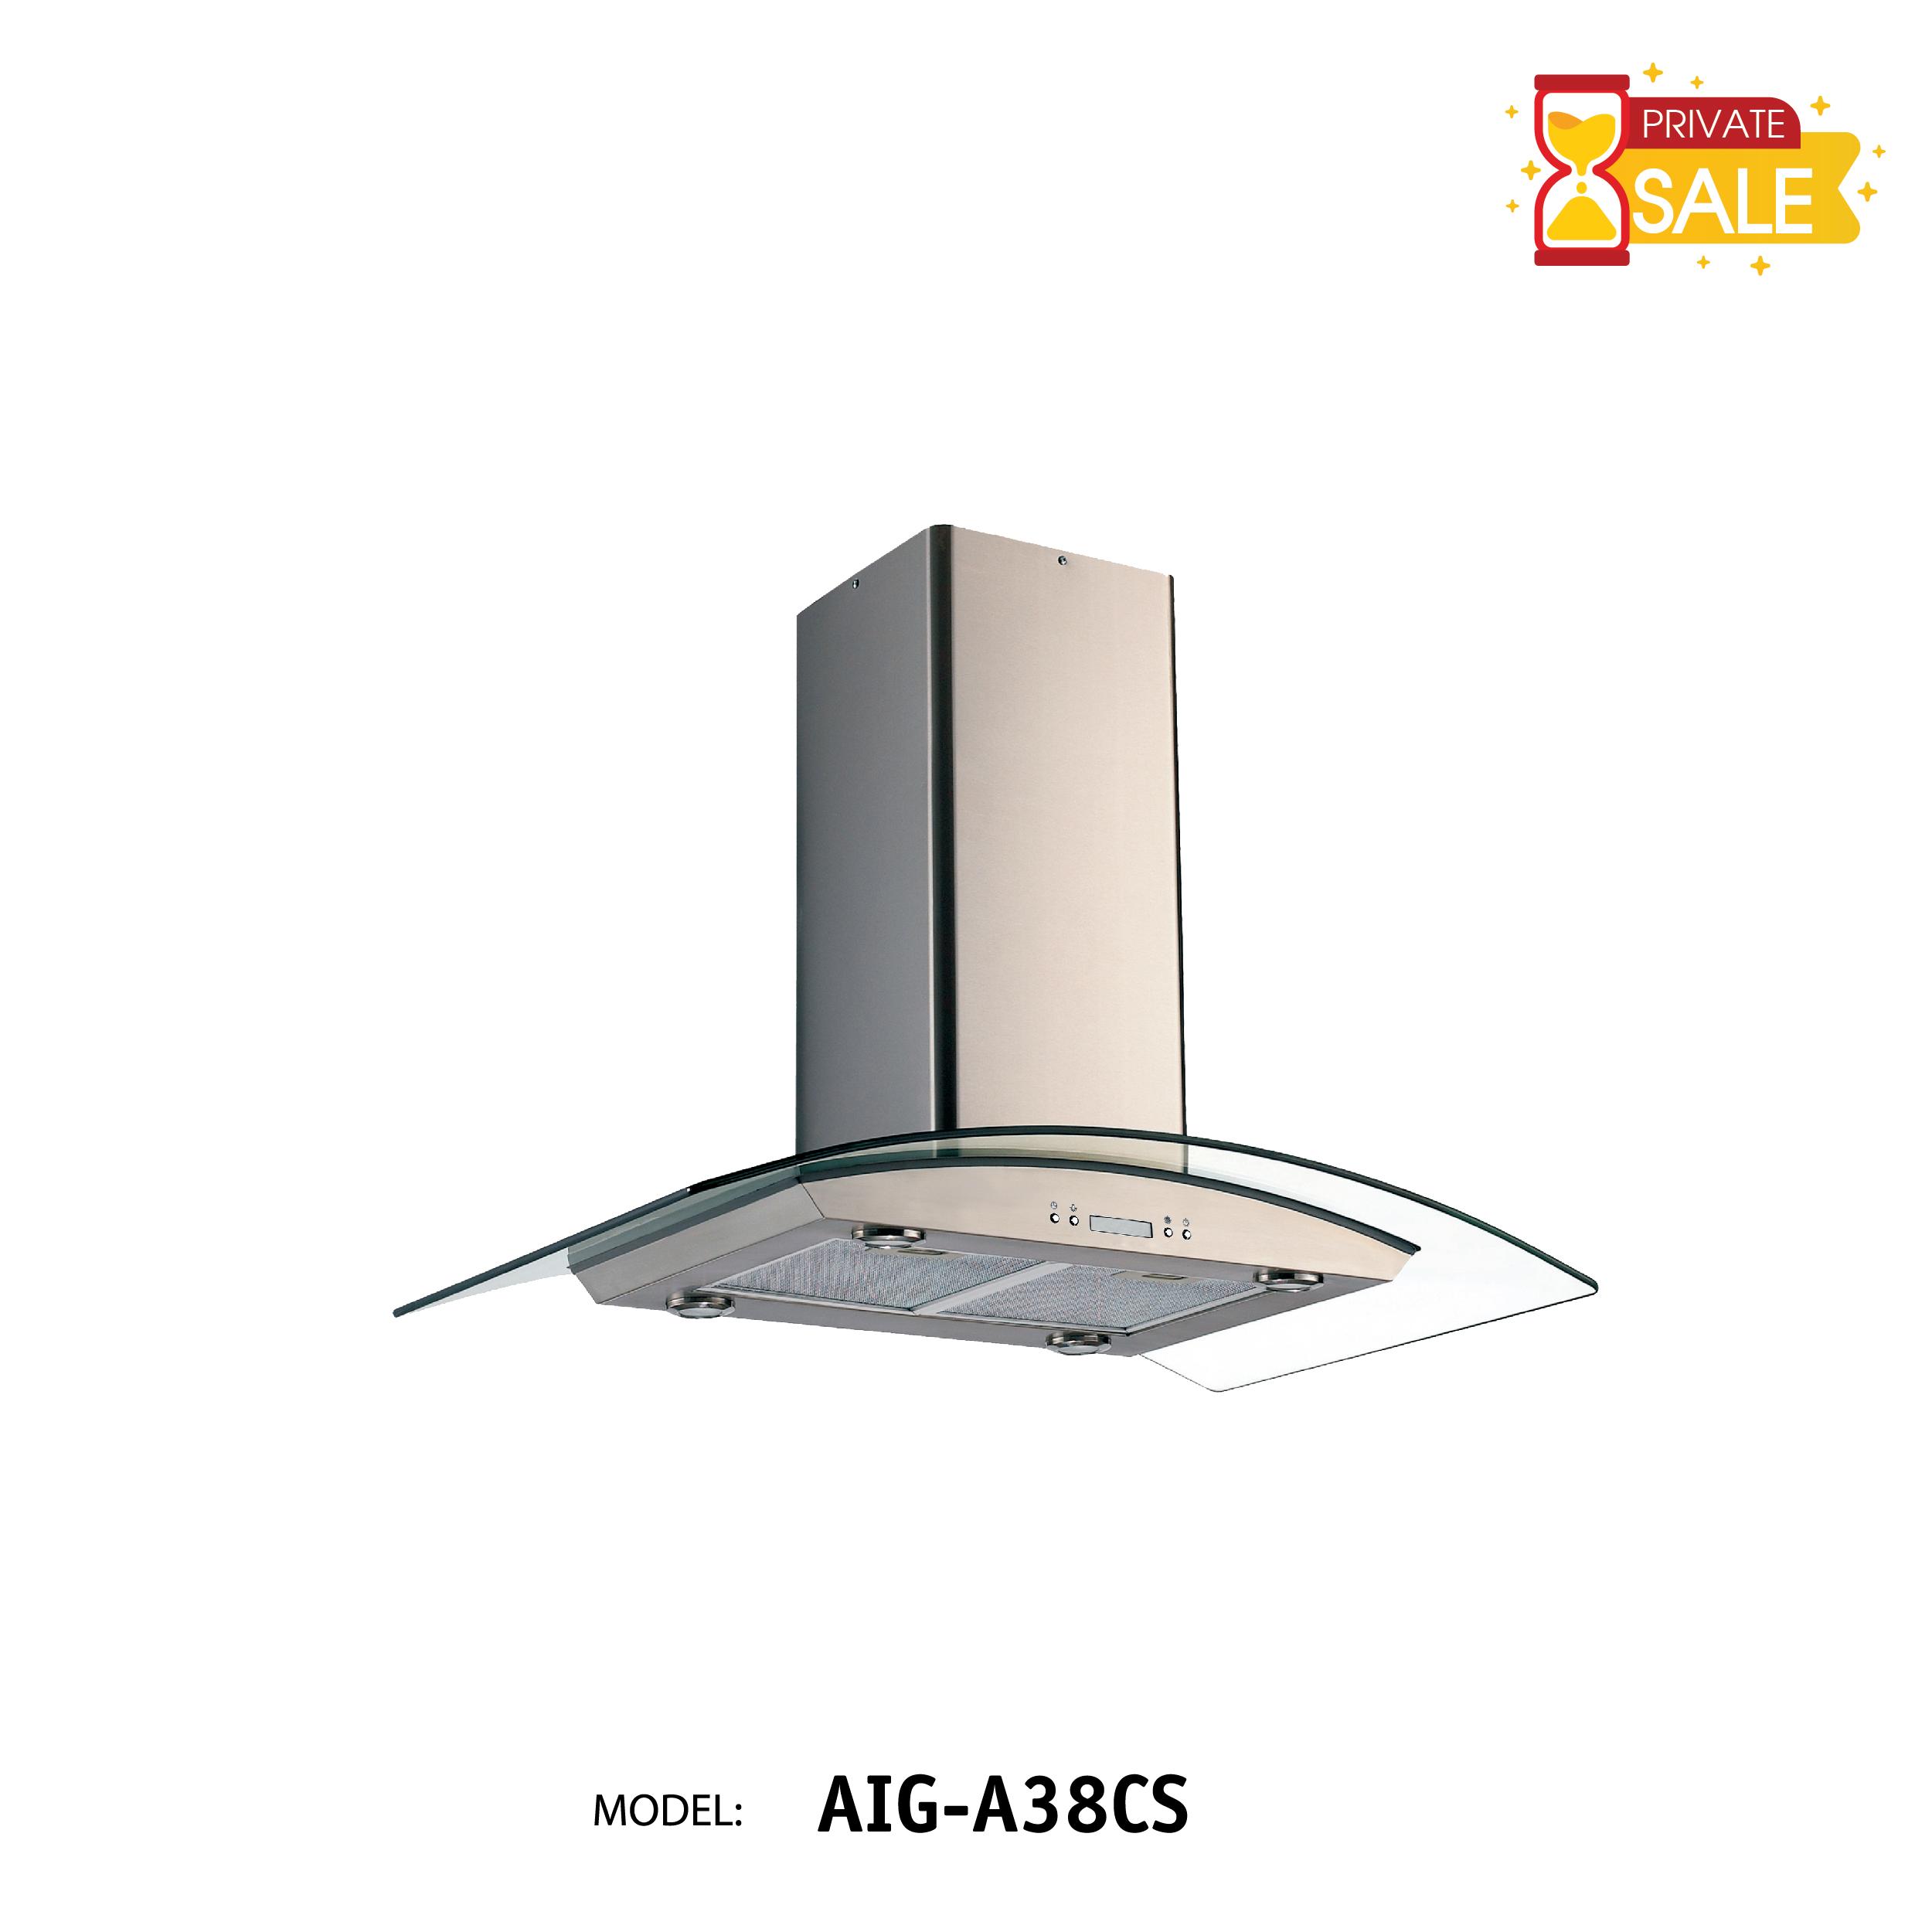 Máy hút mùi áp tường Birillo - Model AIGA38CS